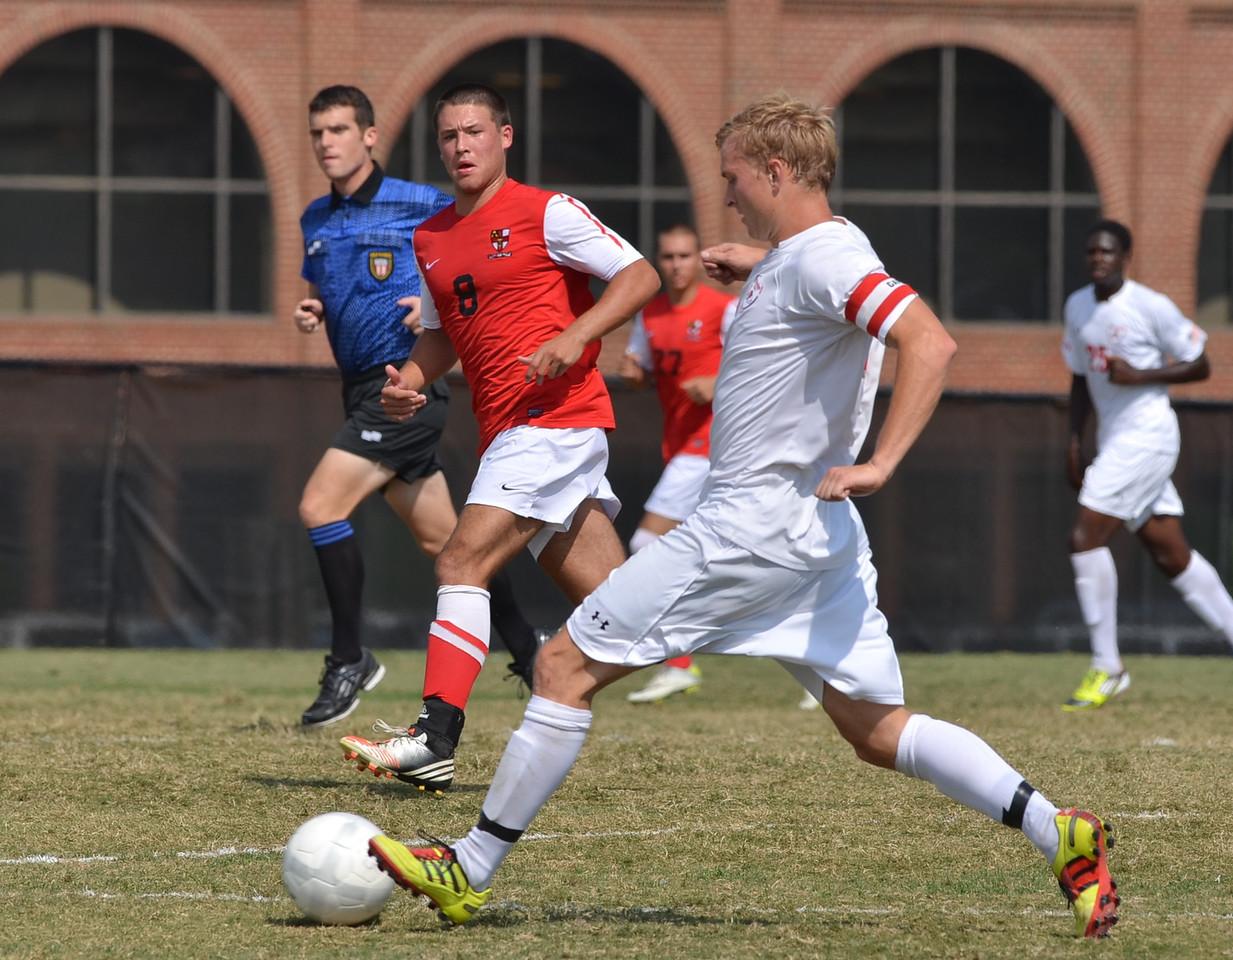 Jon Ole Reinhardsen (4) takes a long stride to pass the ball.